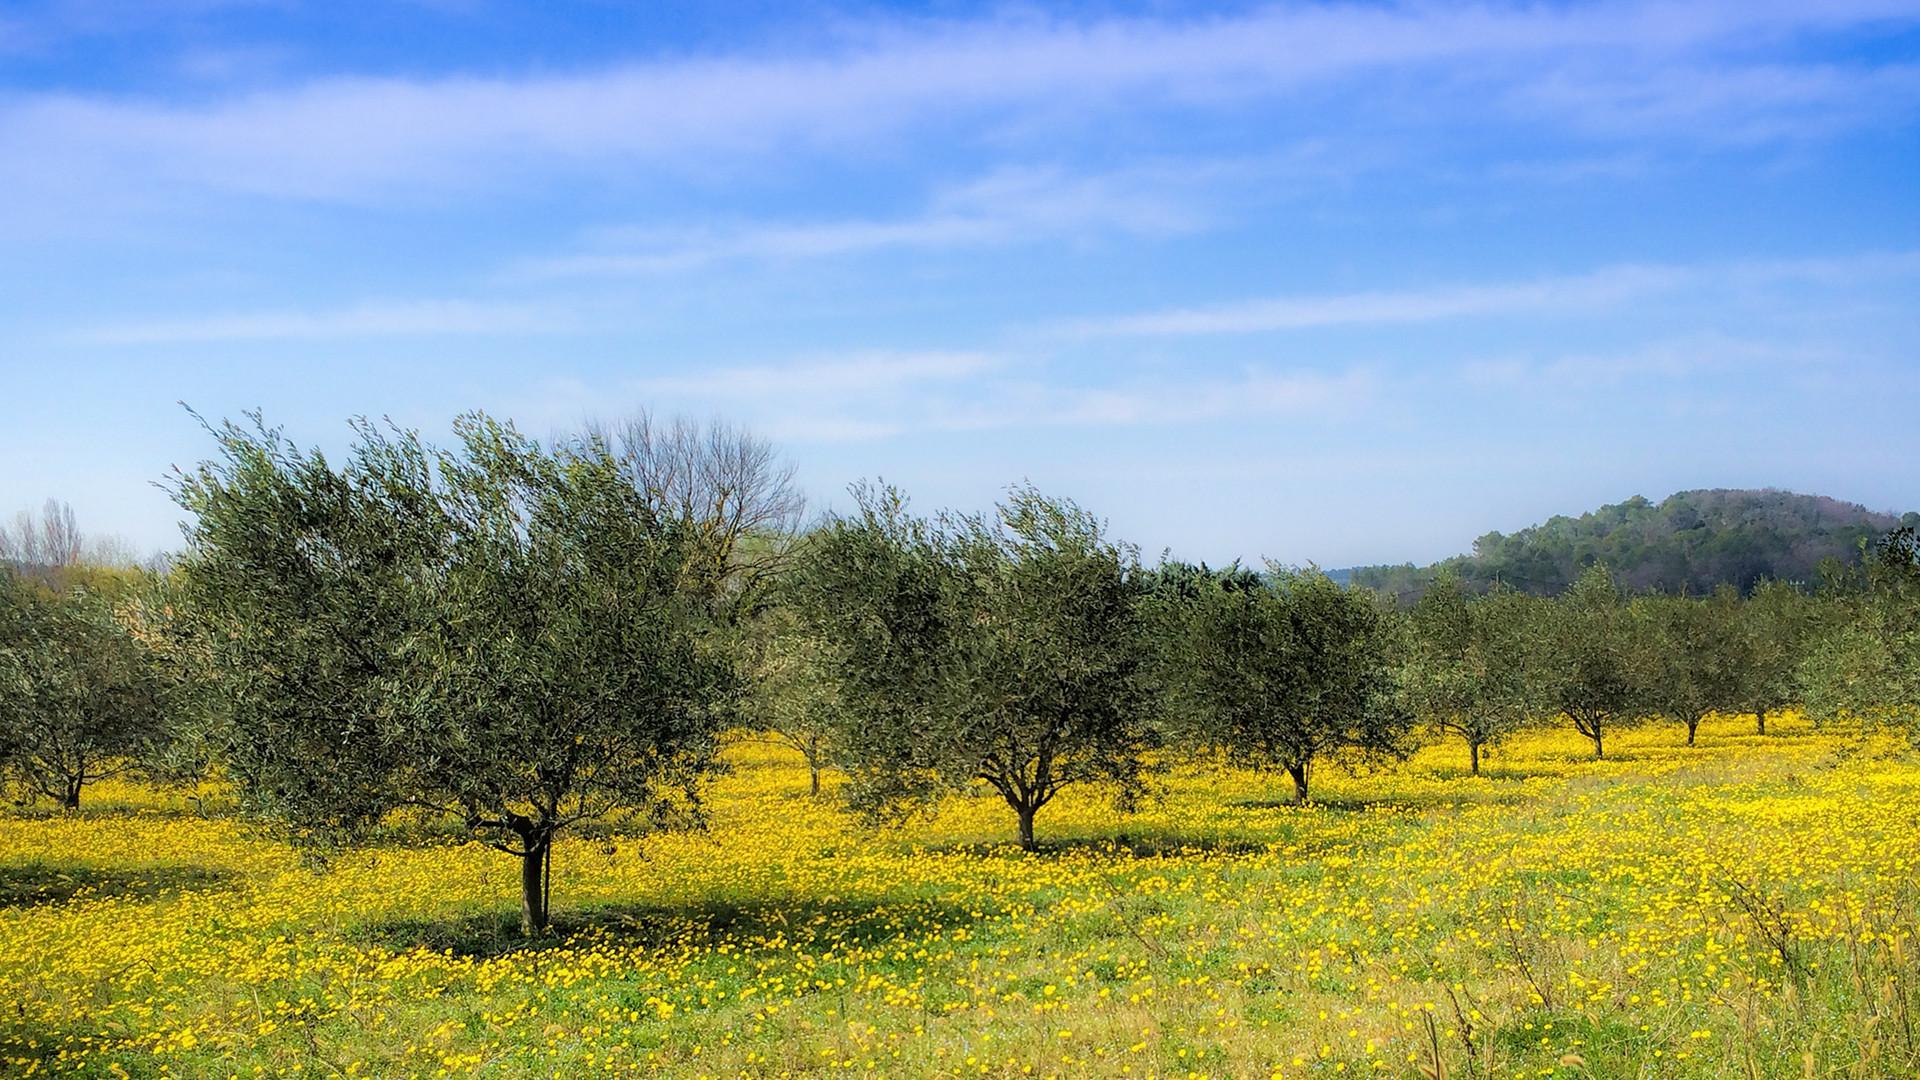 landscape-tree-nature-grass-wilderness-p